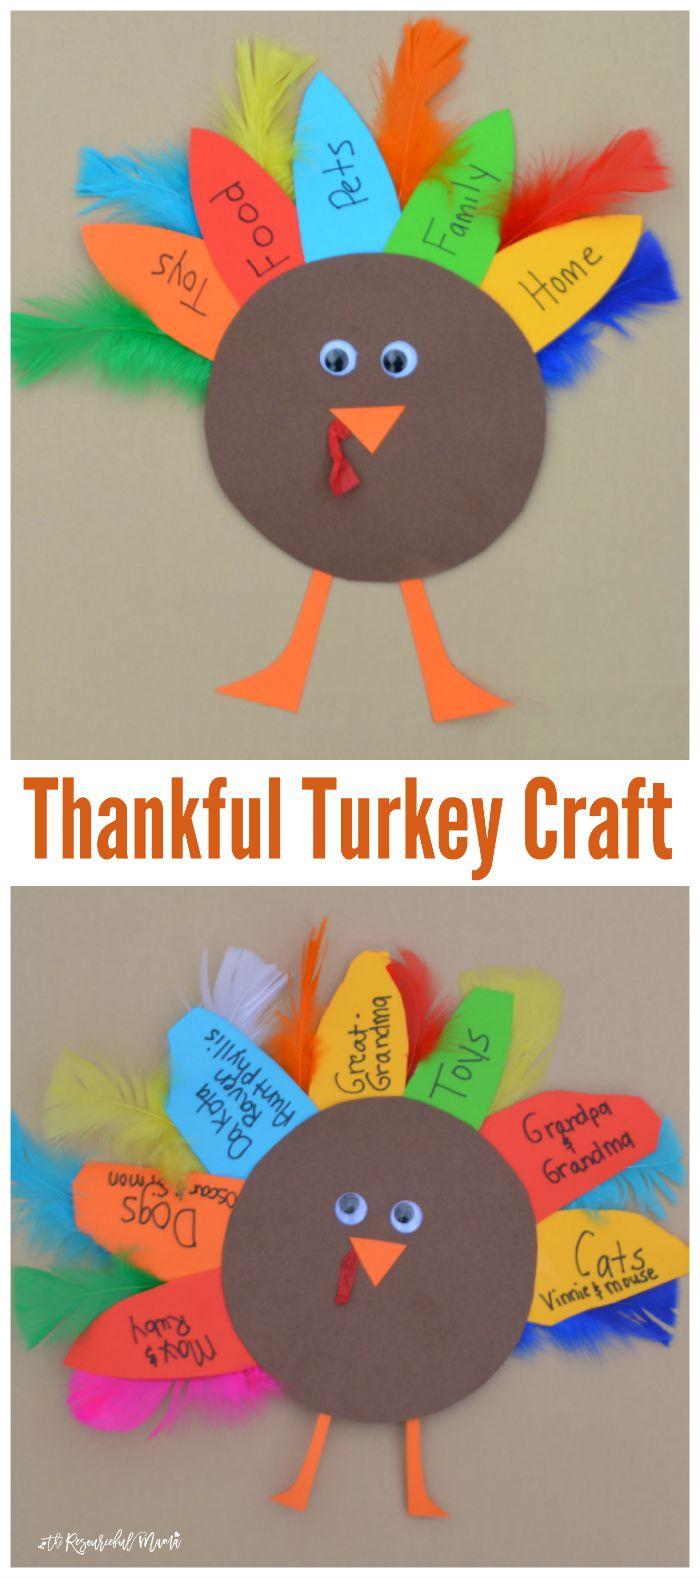 Thankful Turkey Kid Craft and Book - The Resourceful Mama